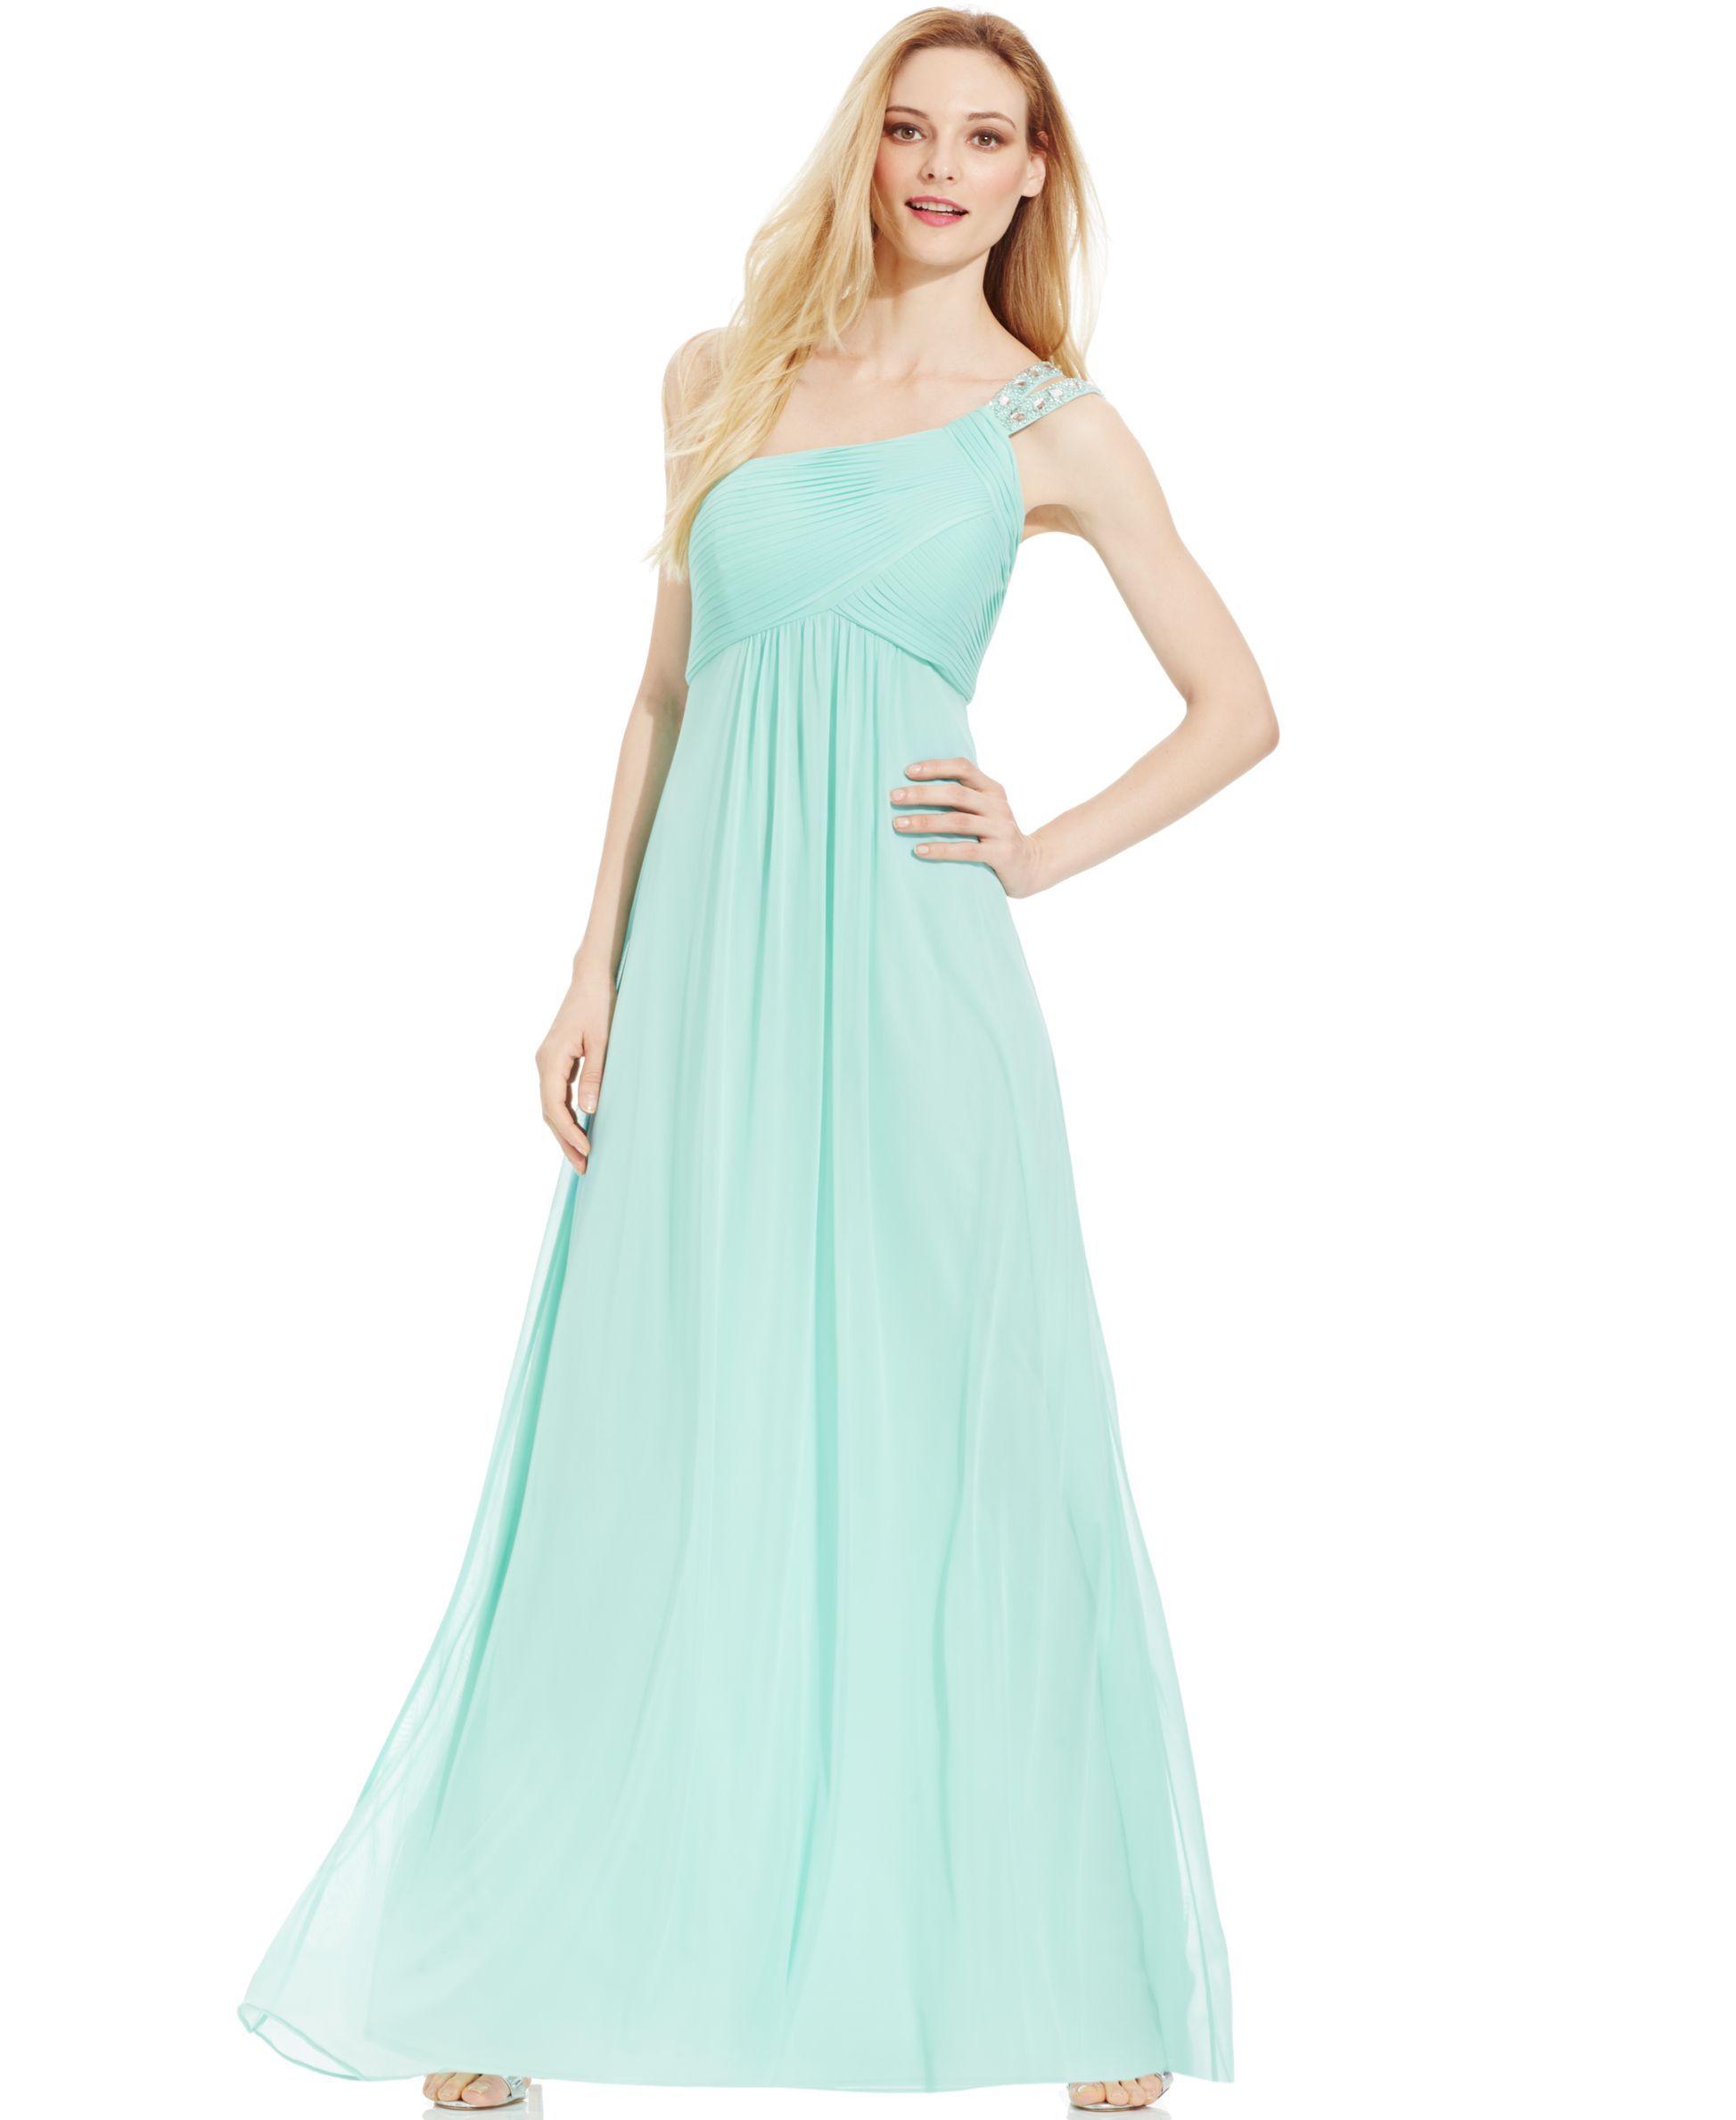 Stunning Macys Prom Dresses Clearance Gallery - Wedding Ideas ...